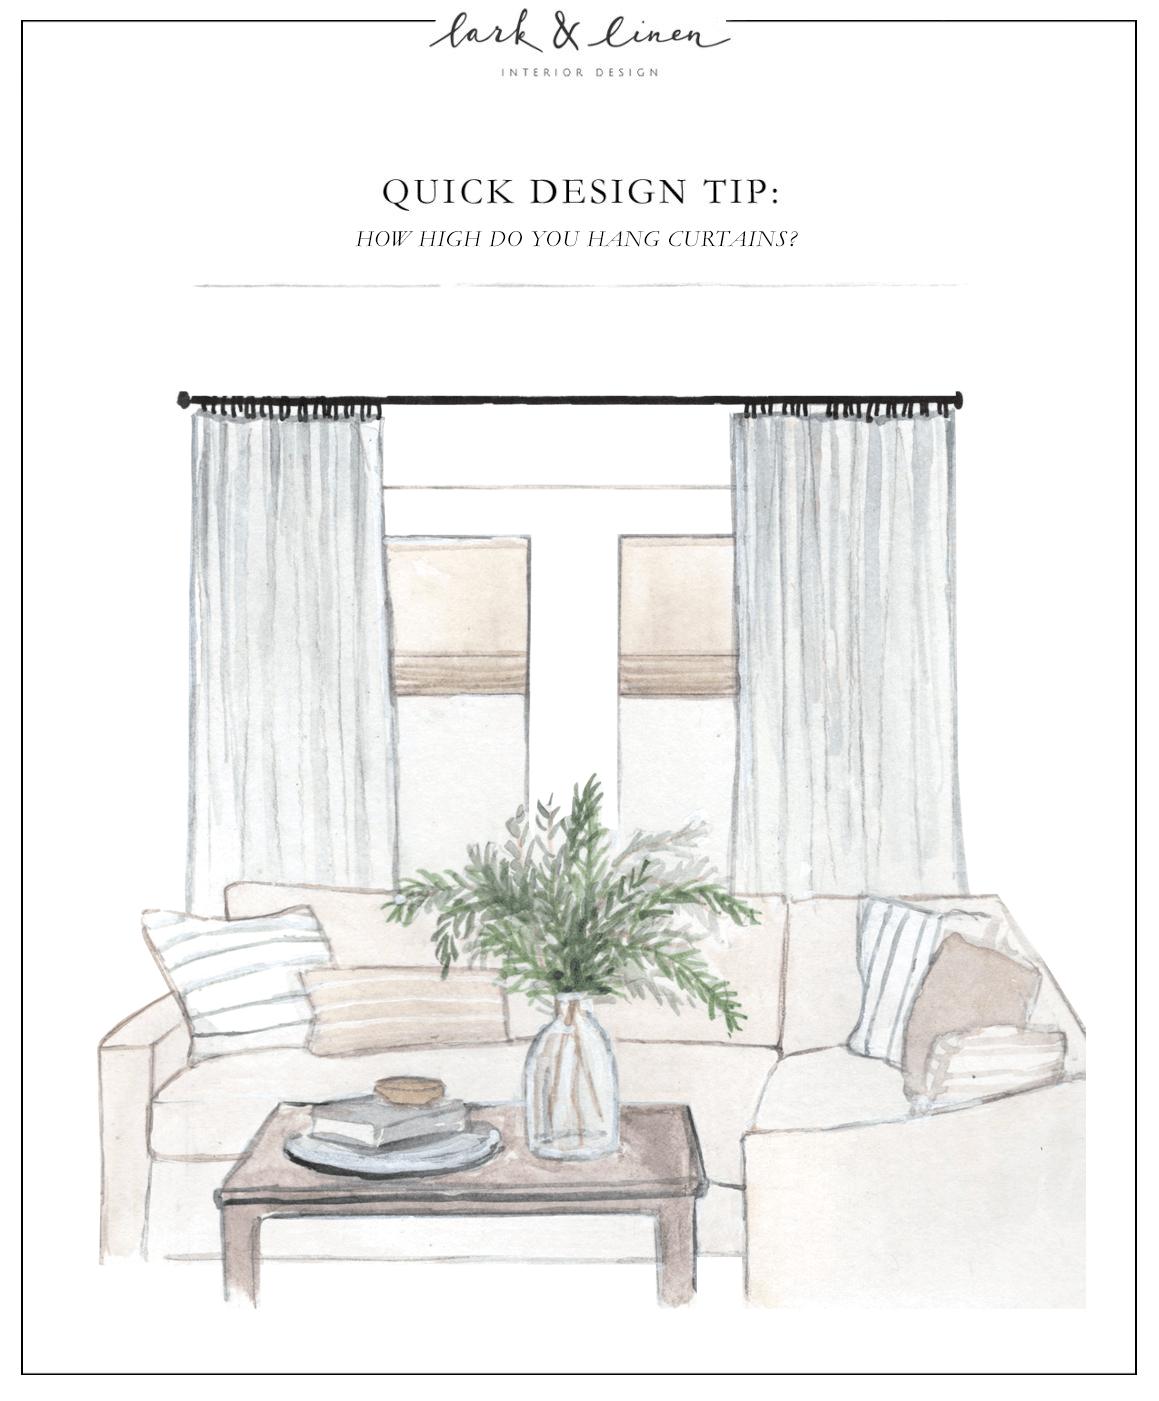 Quick Design Tip How High Do You Hang Curtains Lark Linen